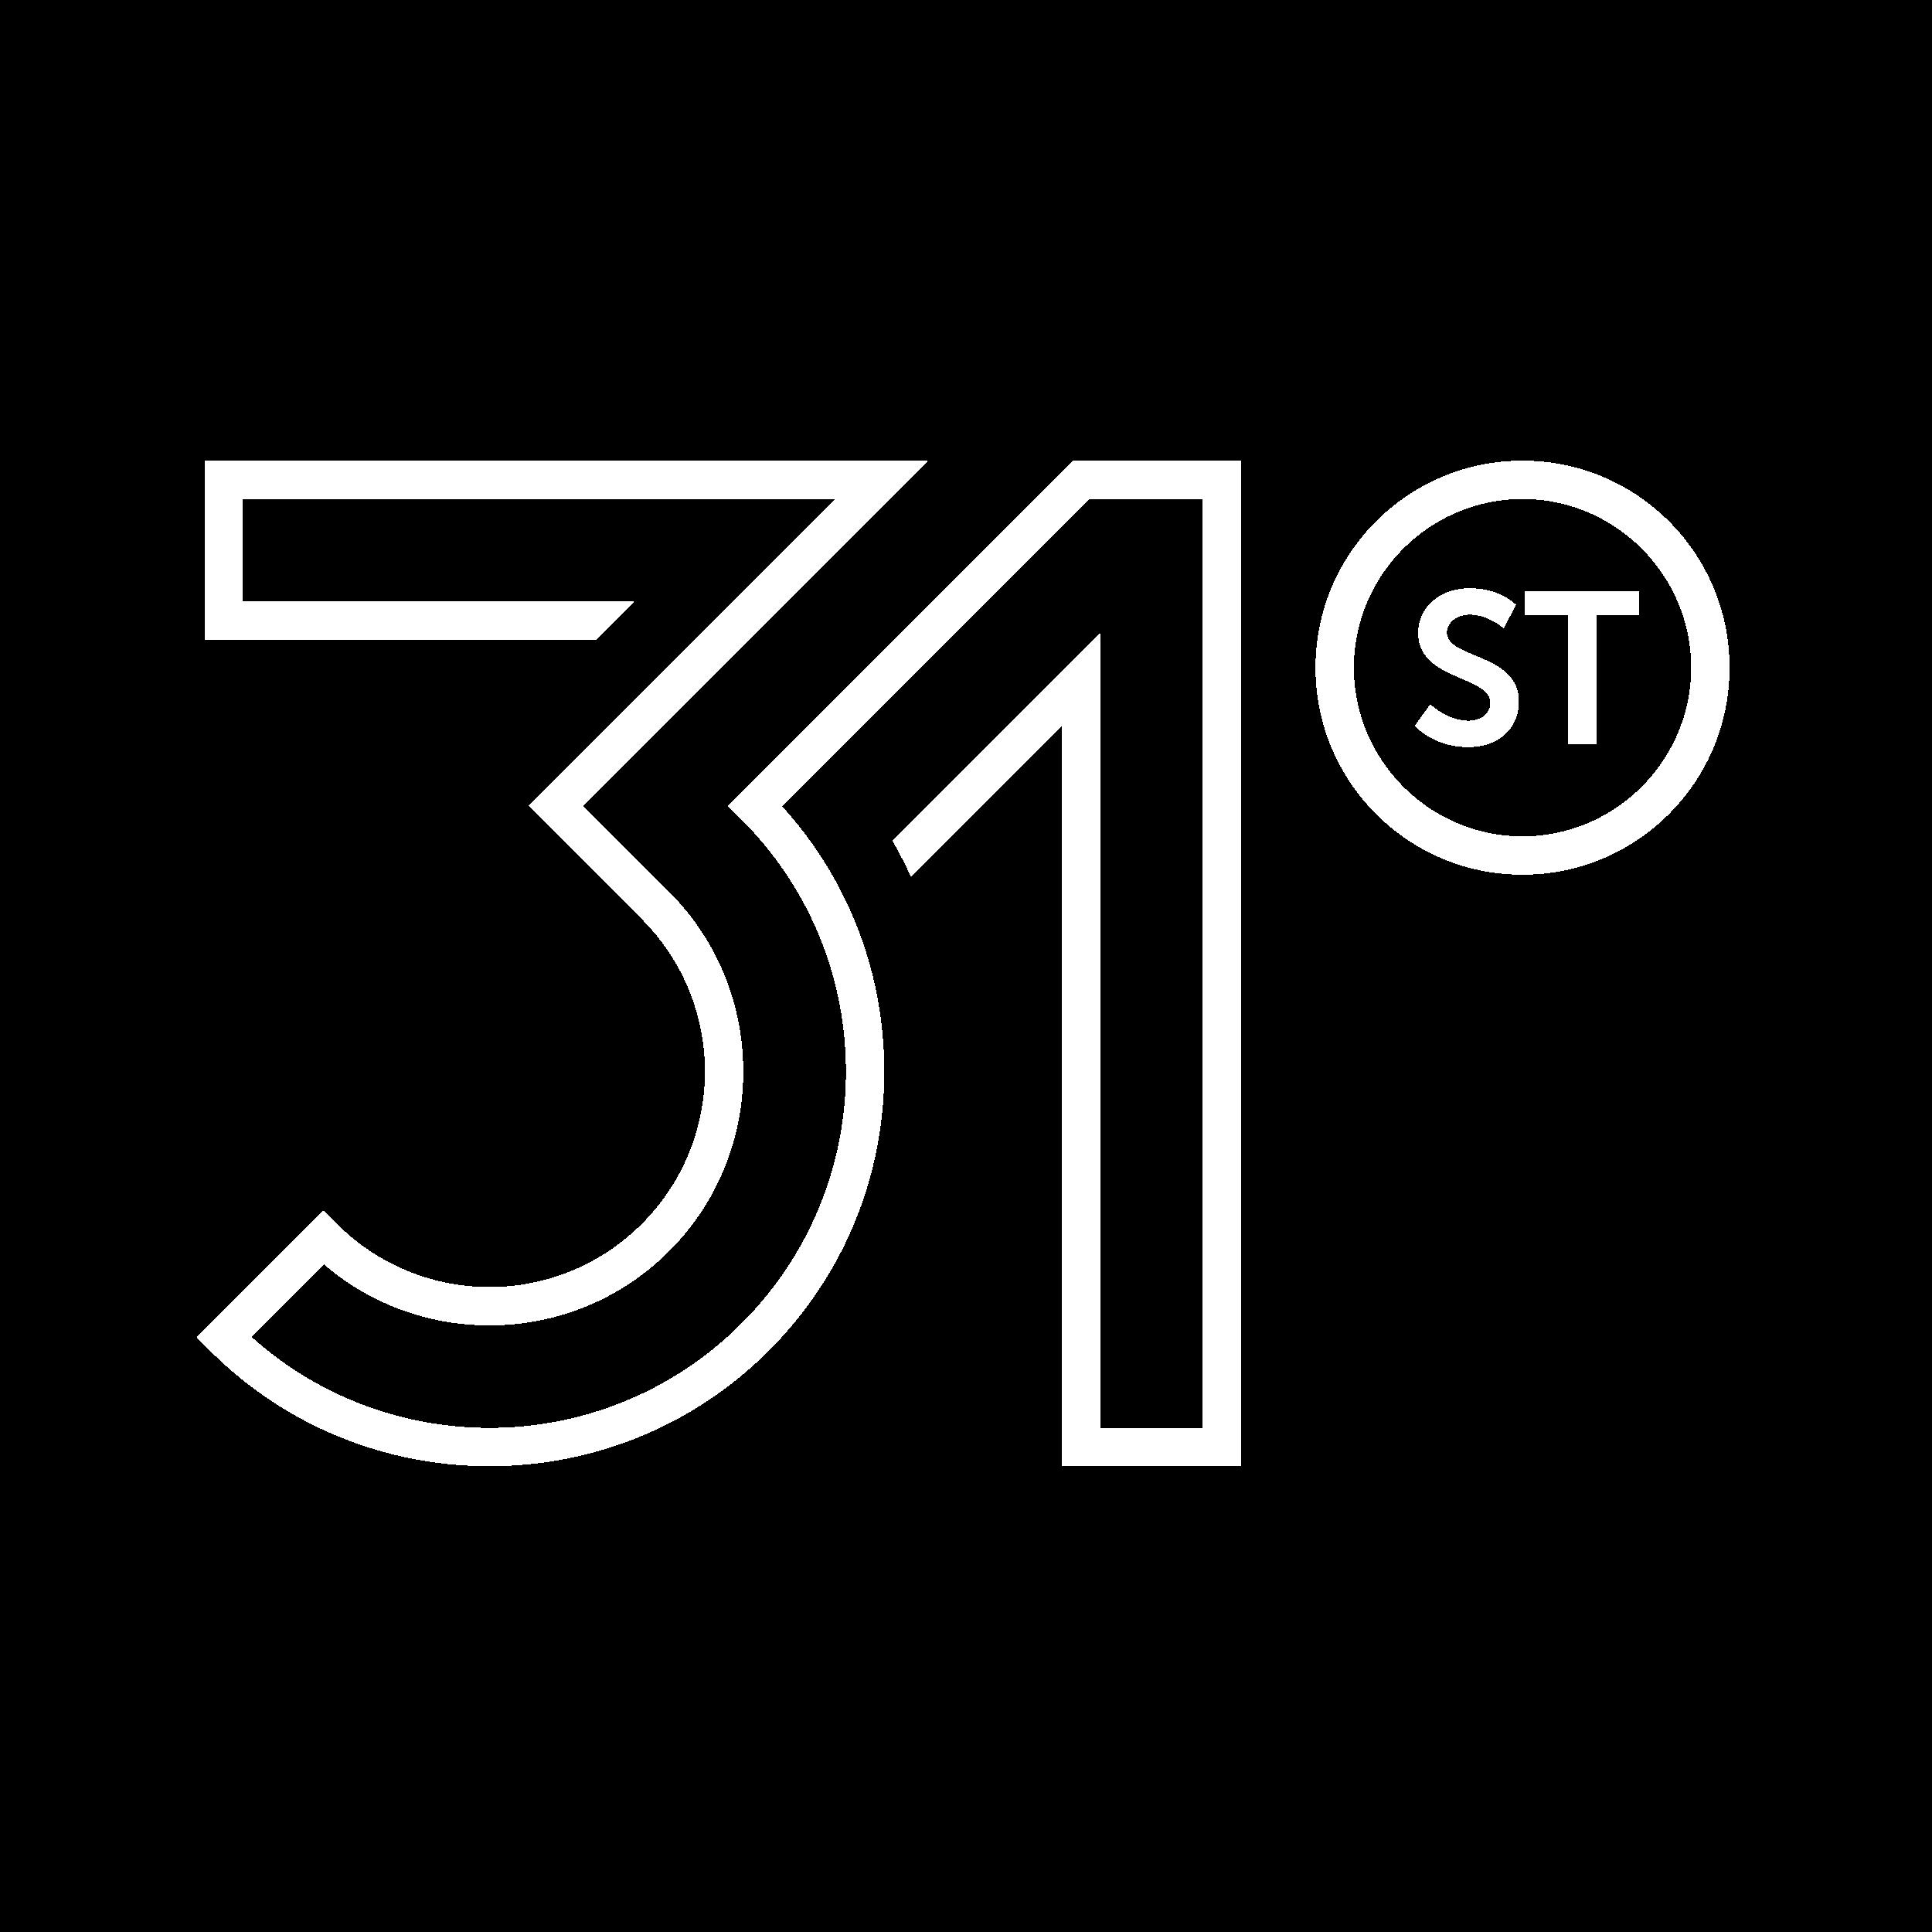 31st logo